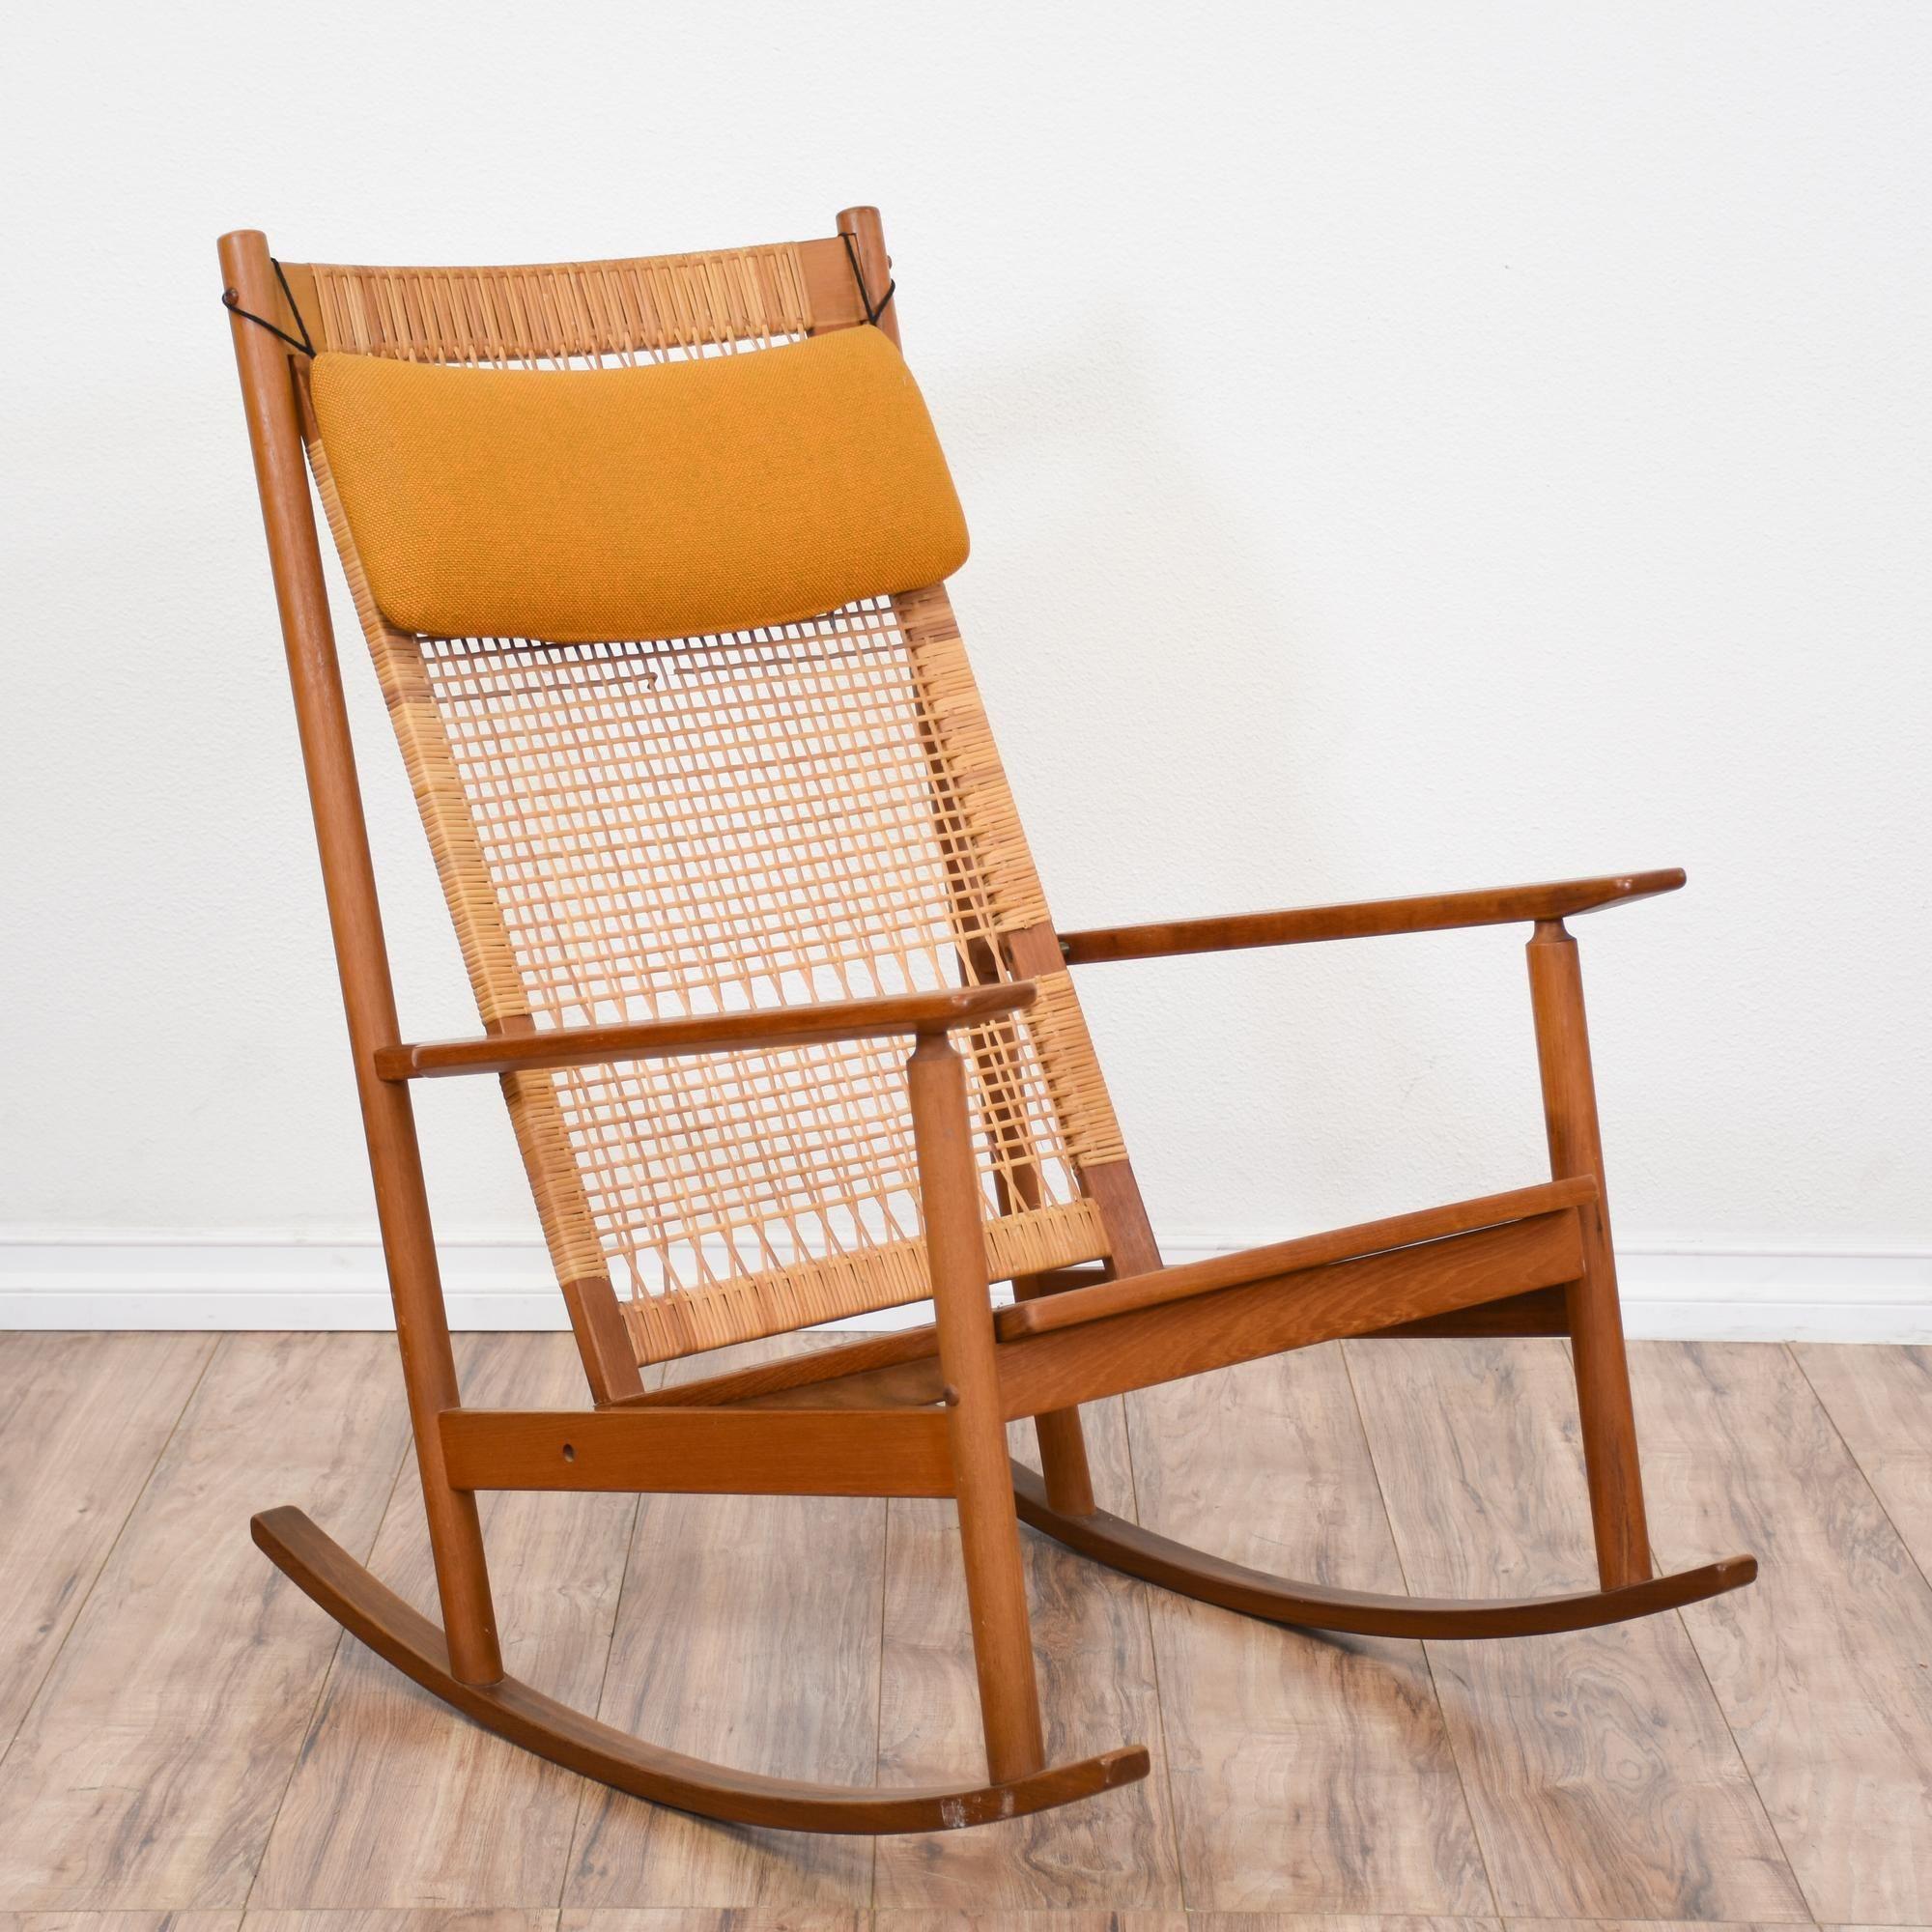 chair modern size century full of ebay rocking caden mid wooden vintage white wood teak bamboo